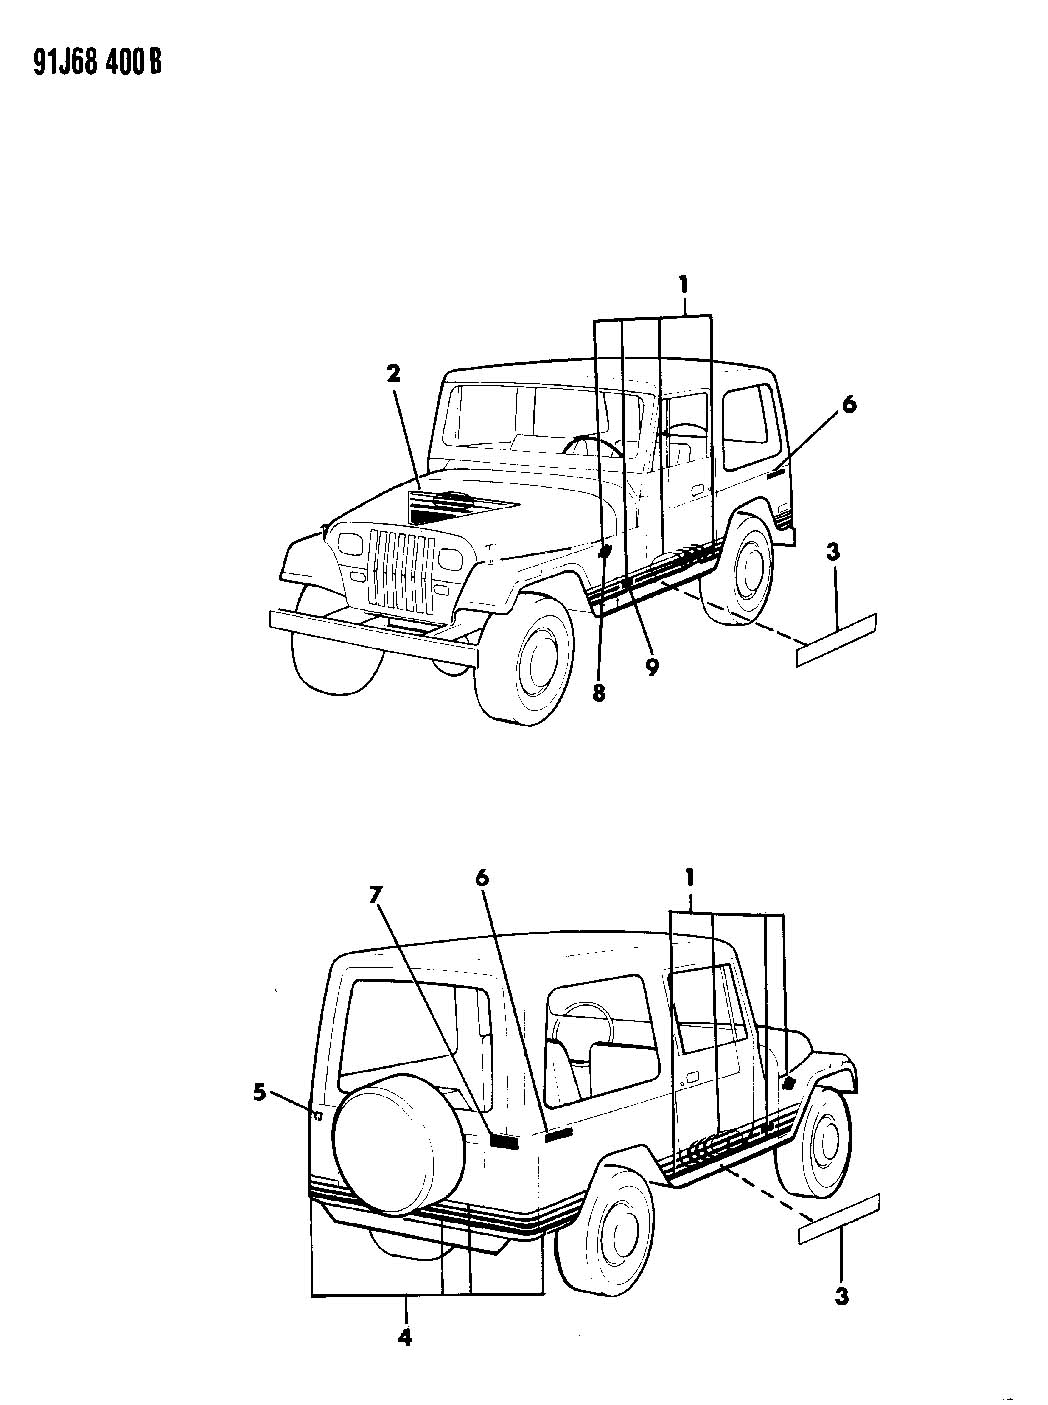 Jeep Wrangler Decals Bodyside And Rear Islander